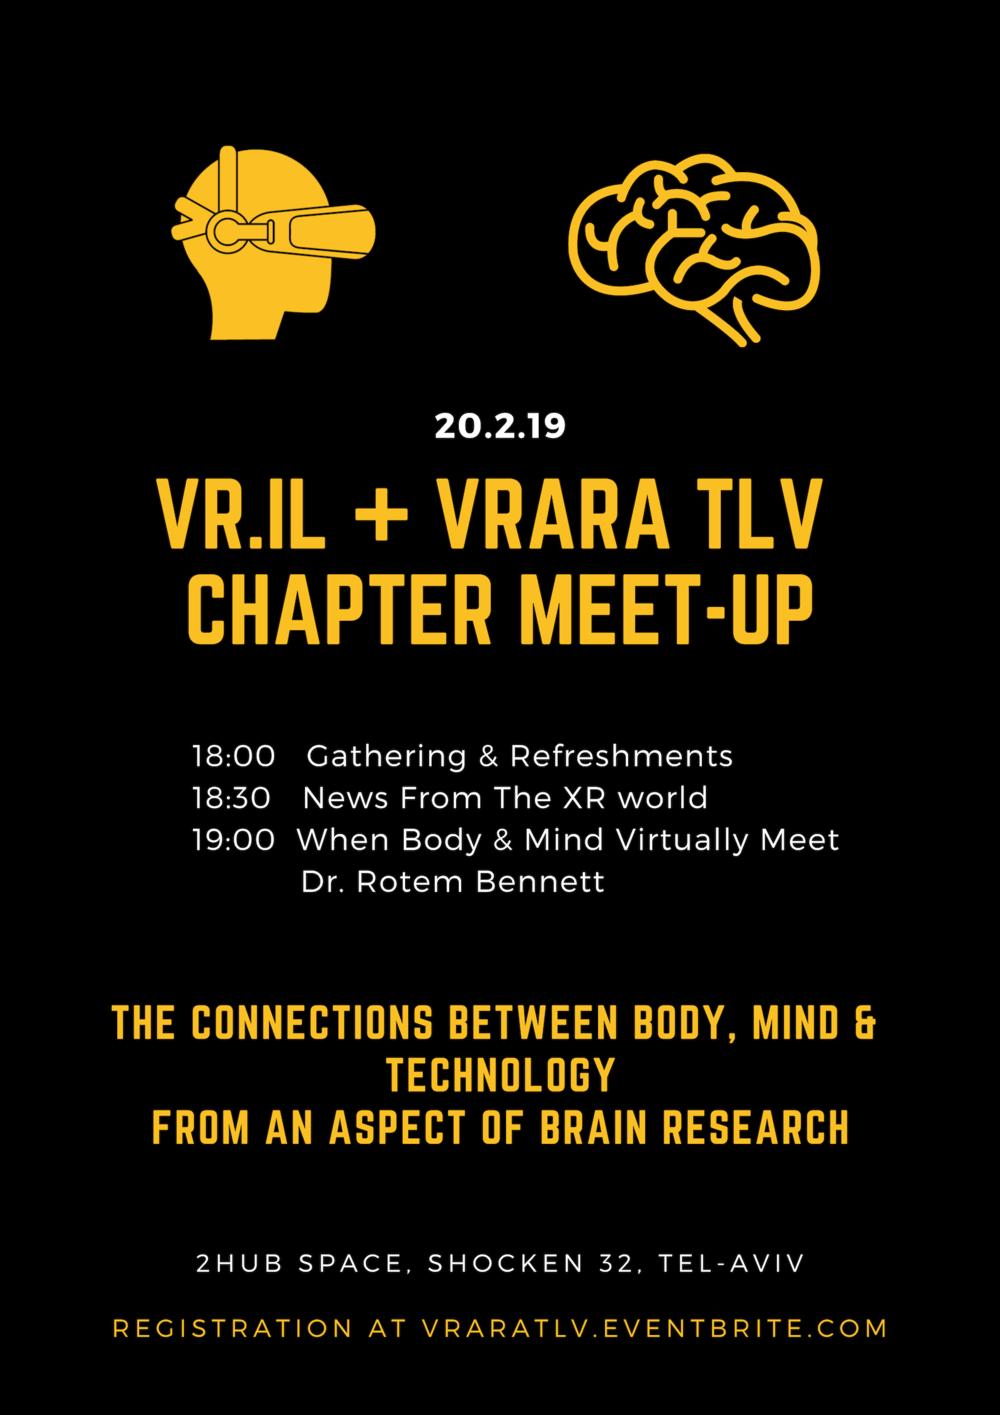 VRARA TLV Chapter meet-up 20.2.19.png